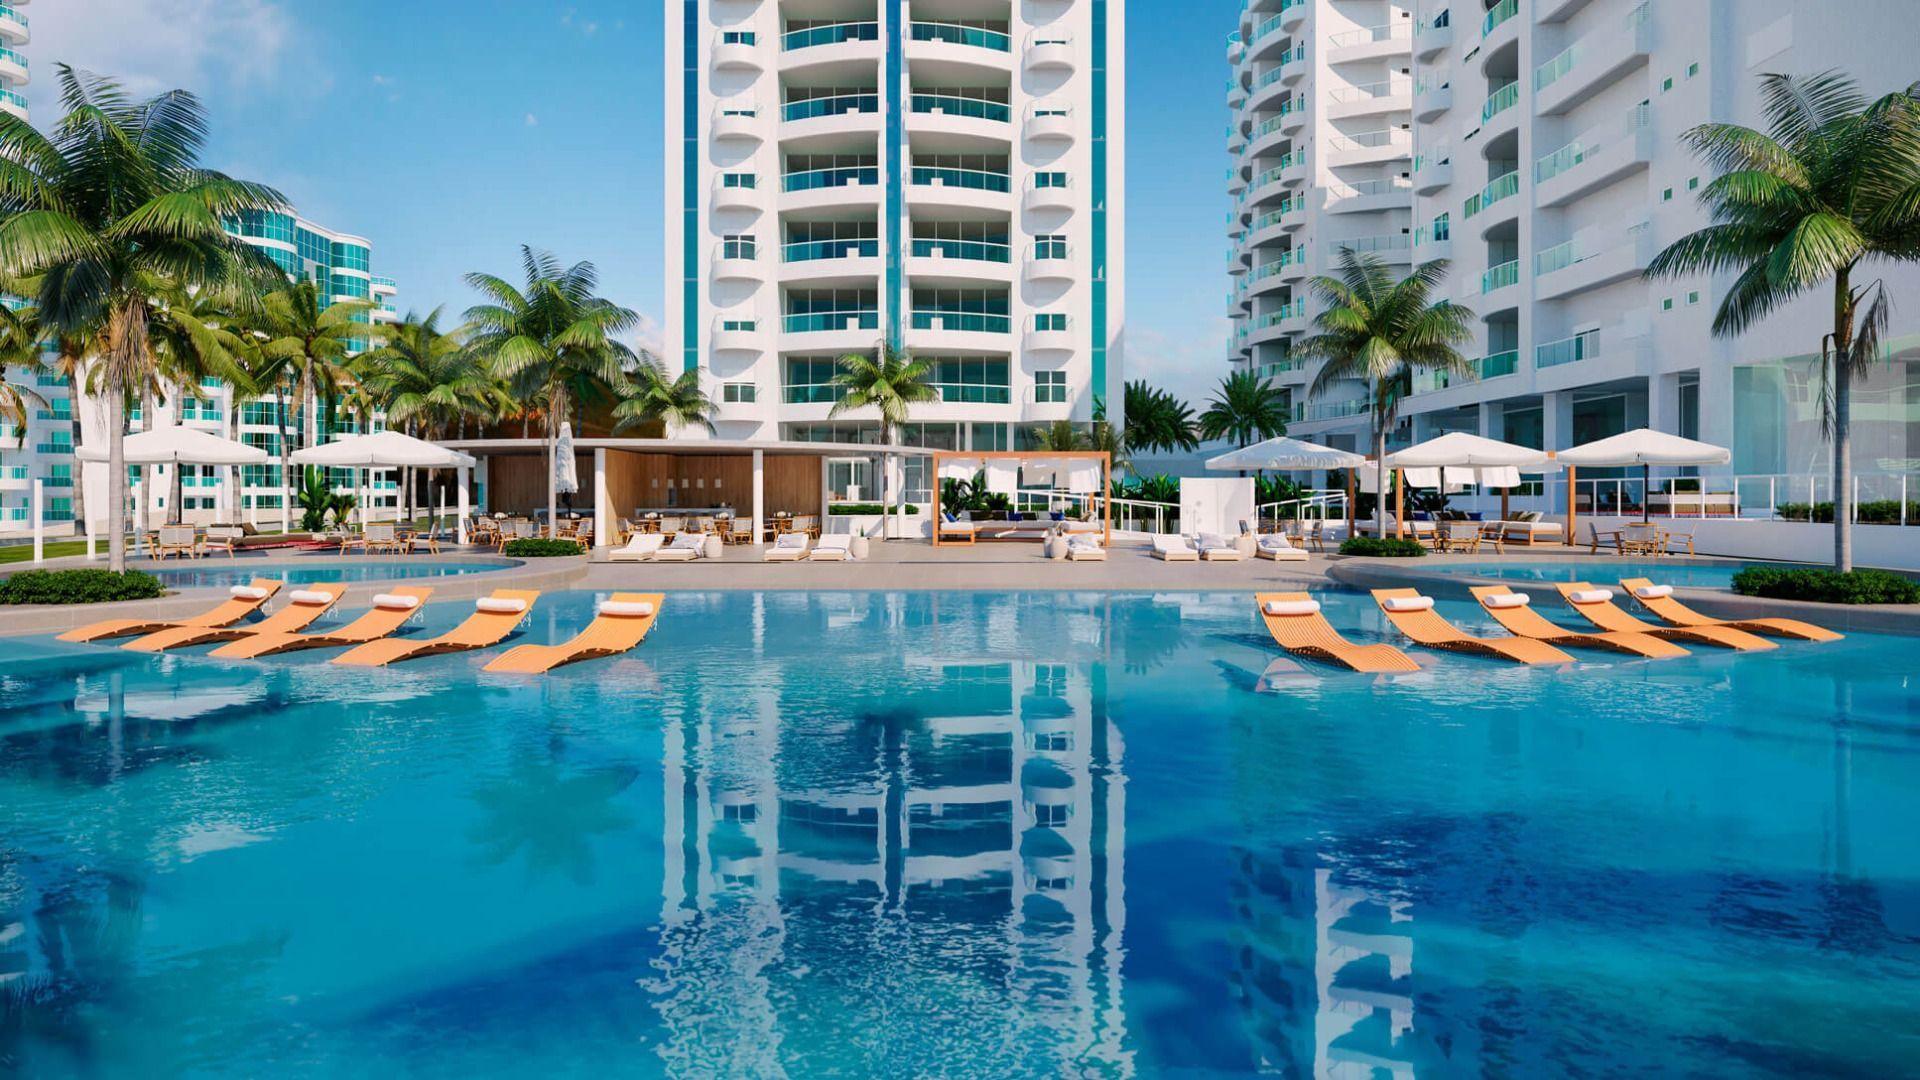 Reserva Figueira Residence – Brava Beach Internacional, foto 3